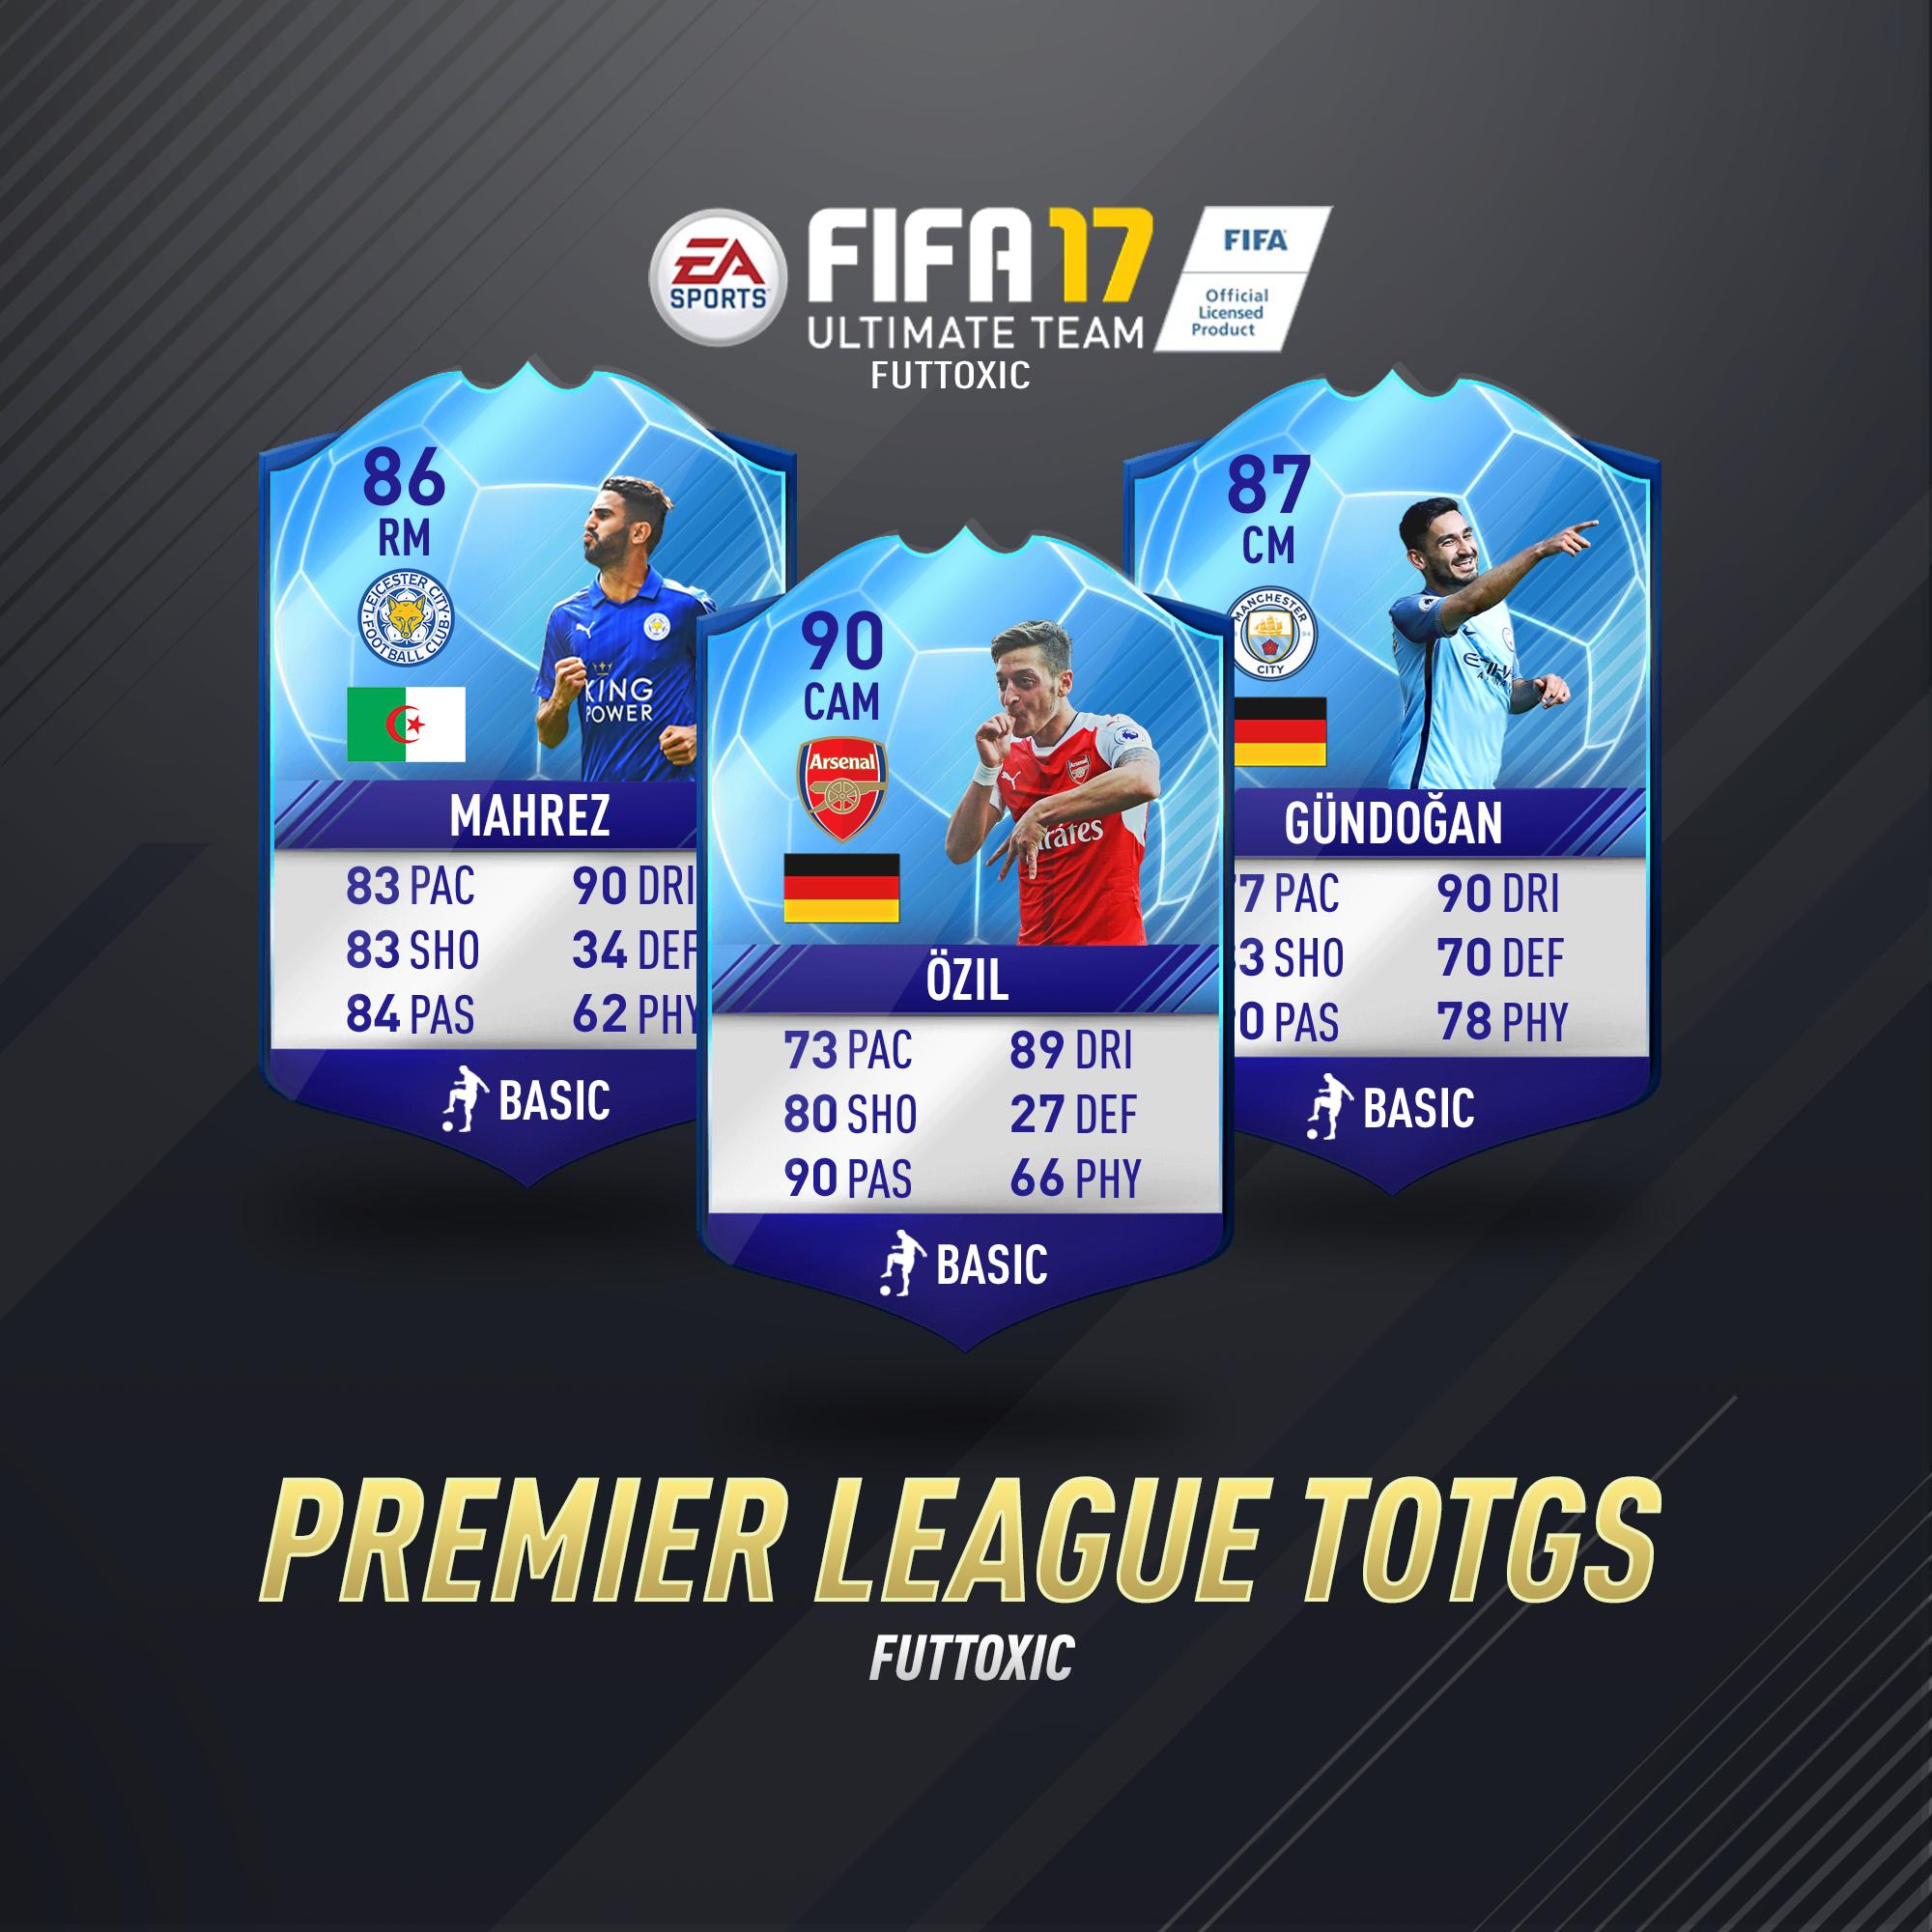 What Are Your Thoughts On The Premier League Totgs Cards Totgs Fut Fut17 Fifa16 Fifa17 Ozil Gundogan Mahrez Futbol German Fifa Fifa 17 Fifa Games